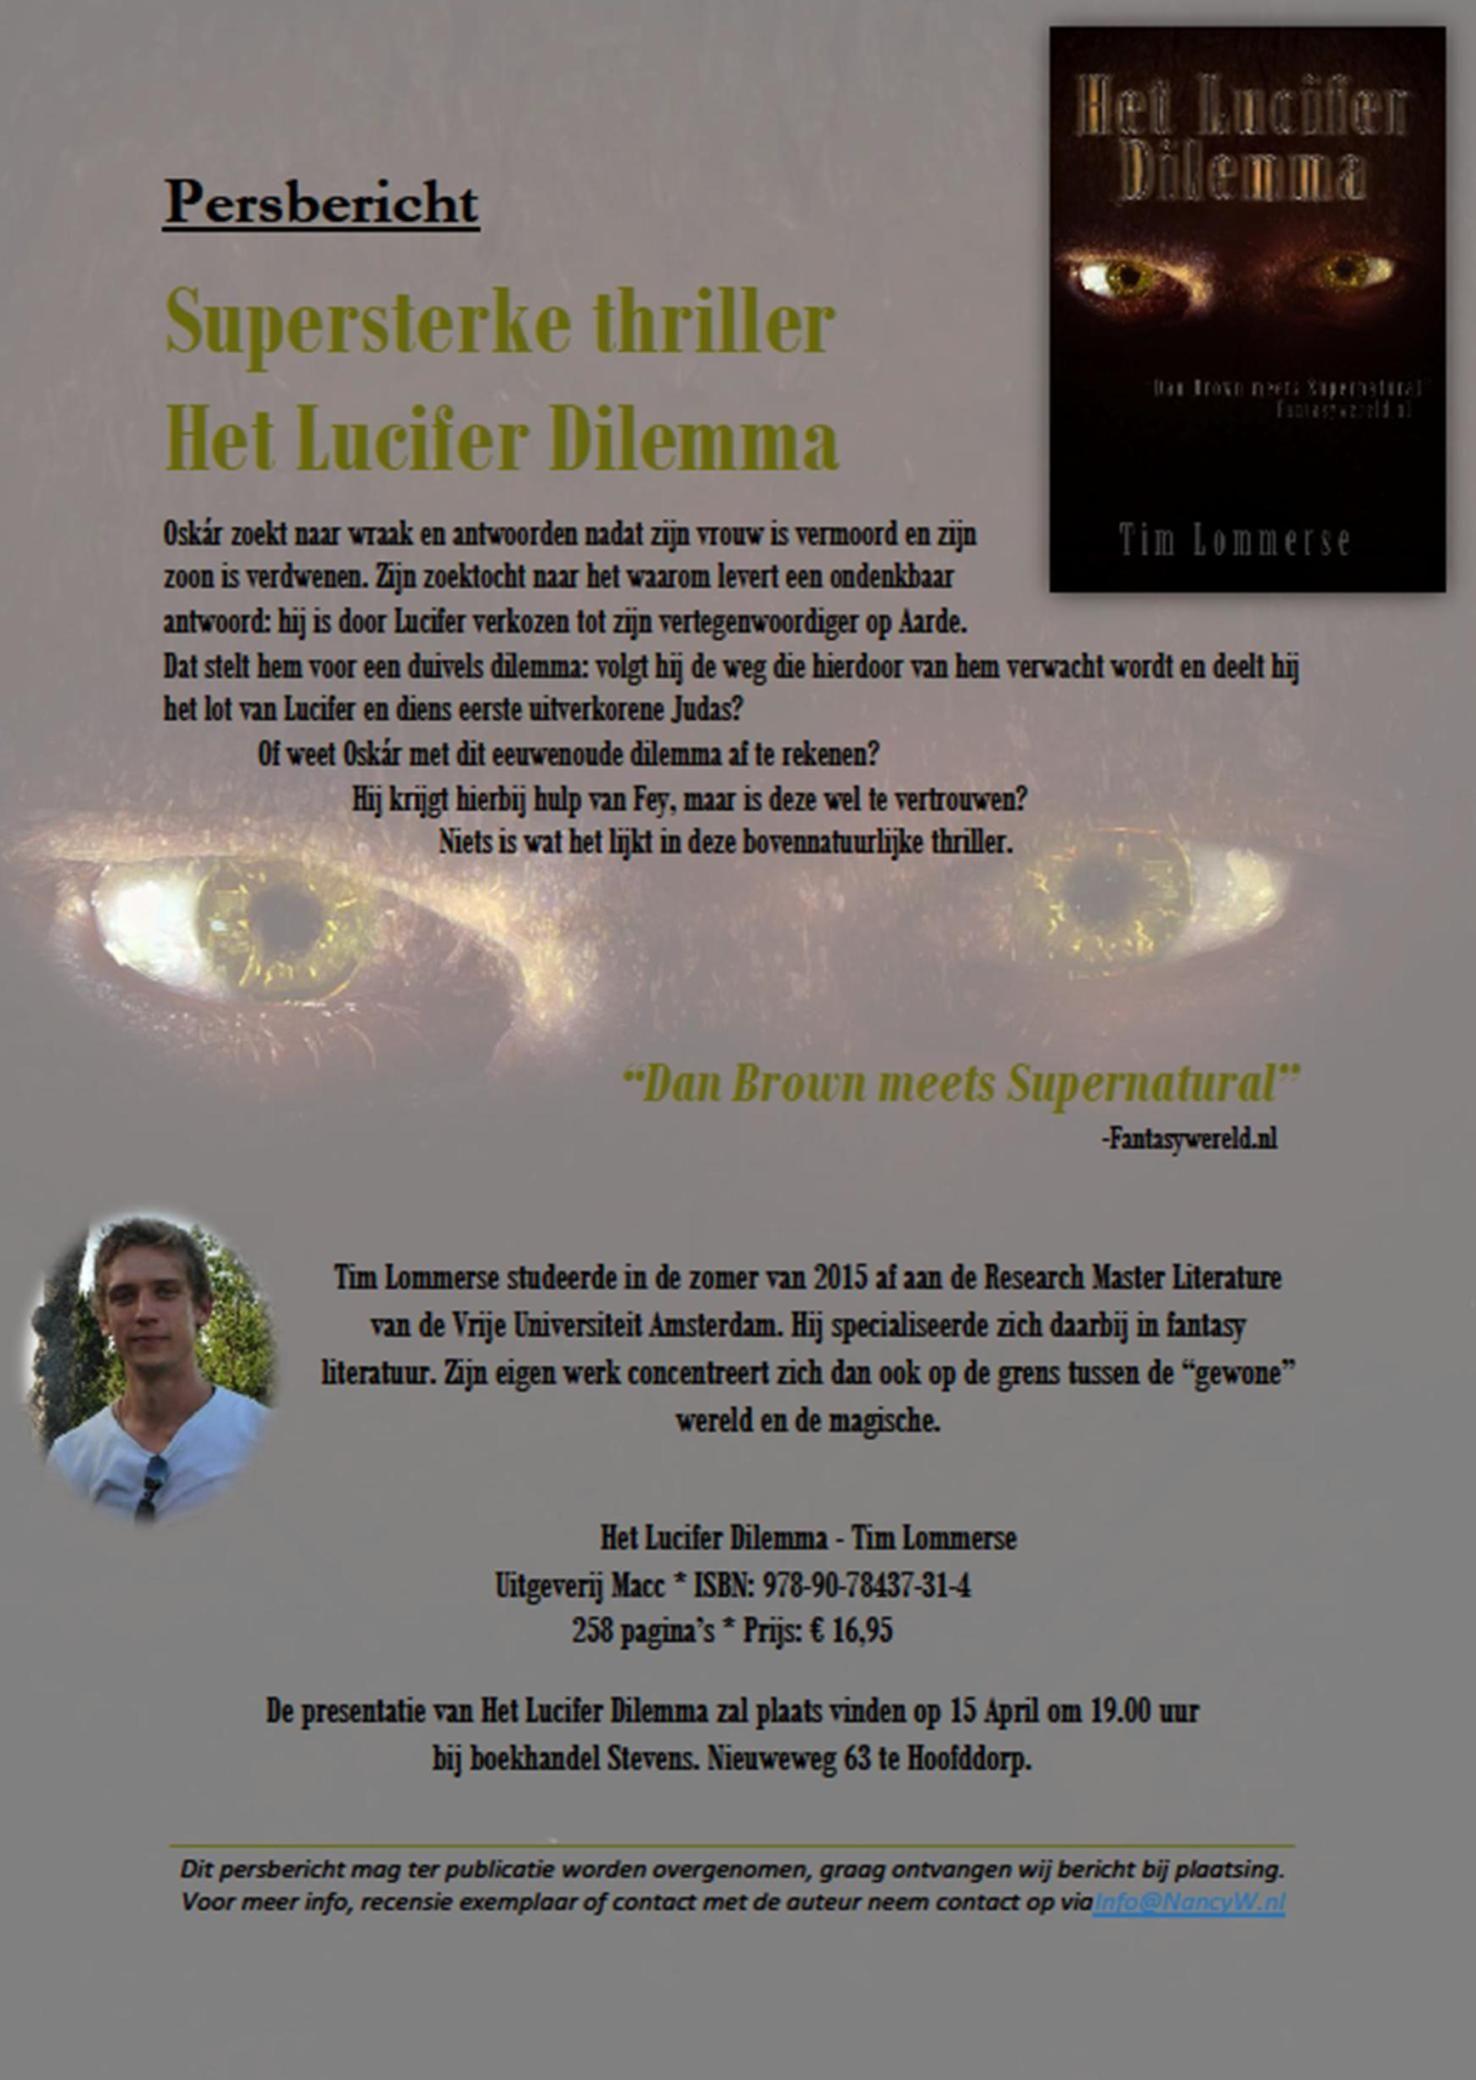 Persbericht Het Lucifer Dilemma - Tim Lommerse